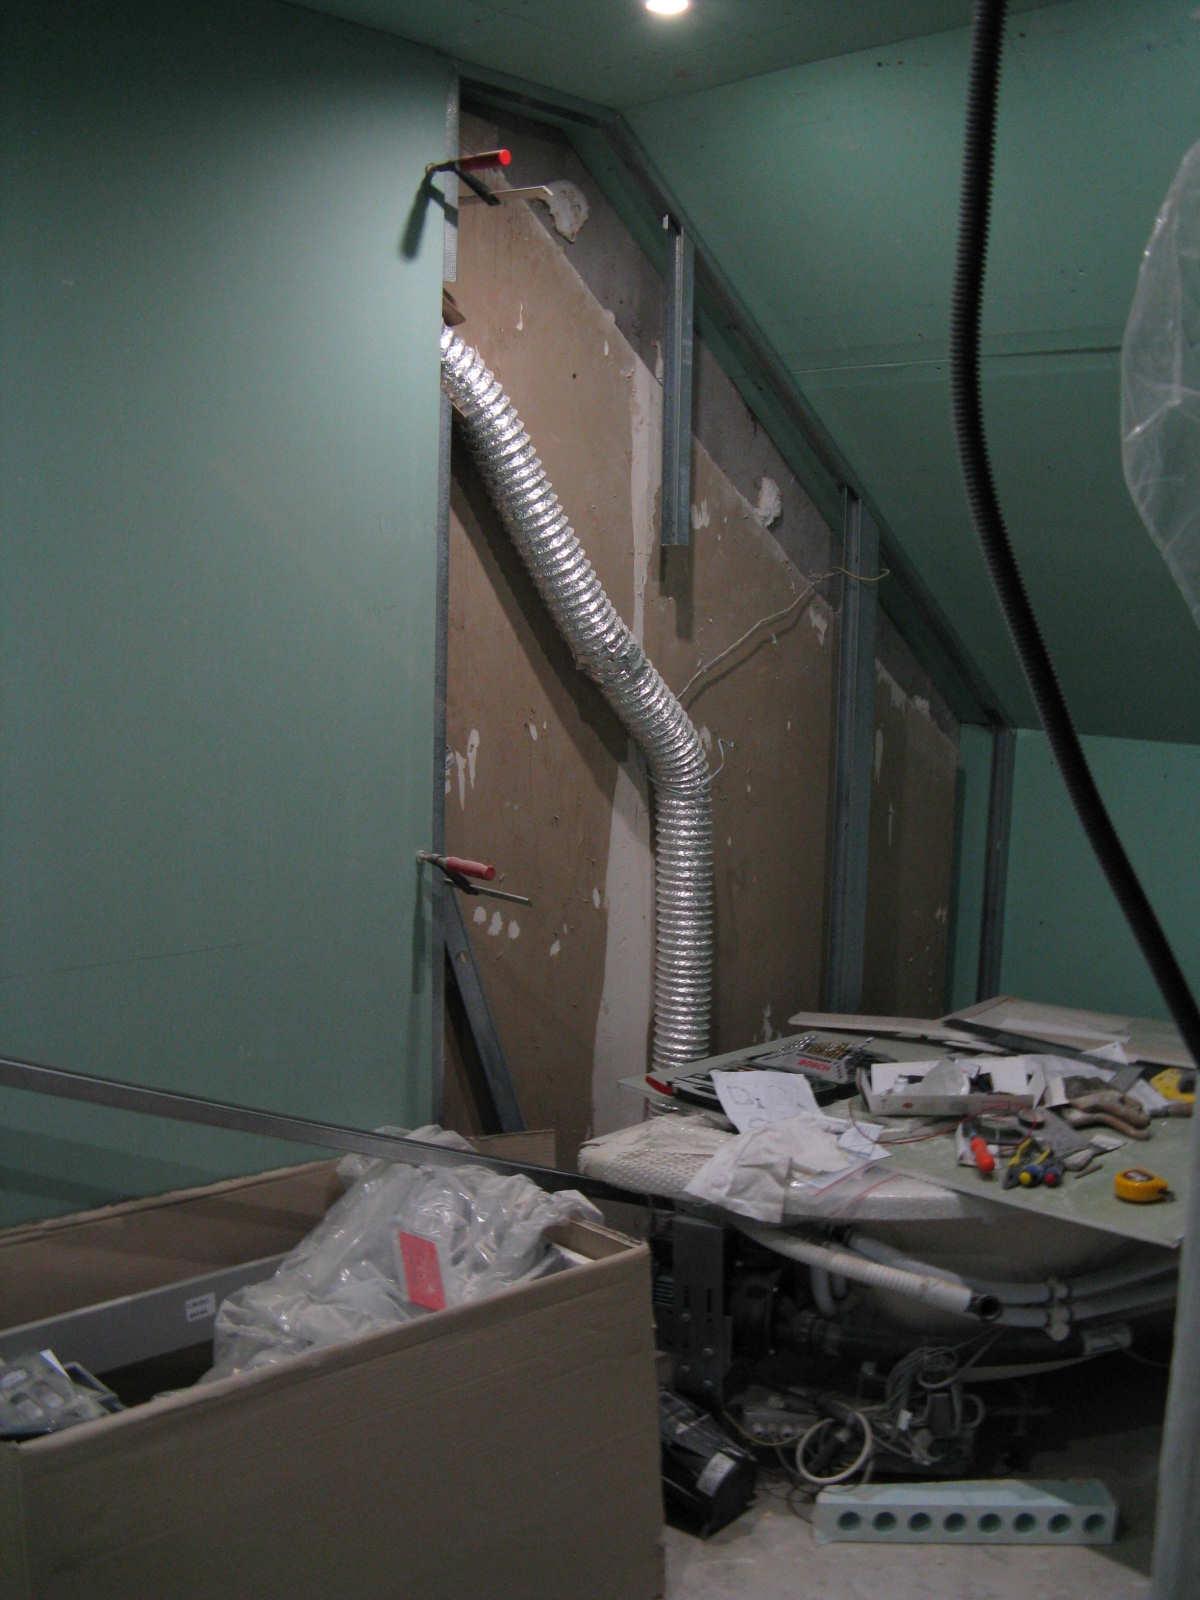 Installation des spots de la salle de bain higsblog for Installation spot salle de bain